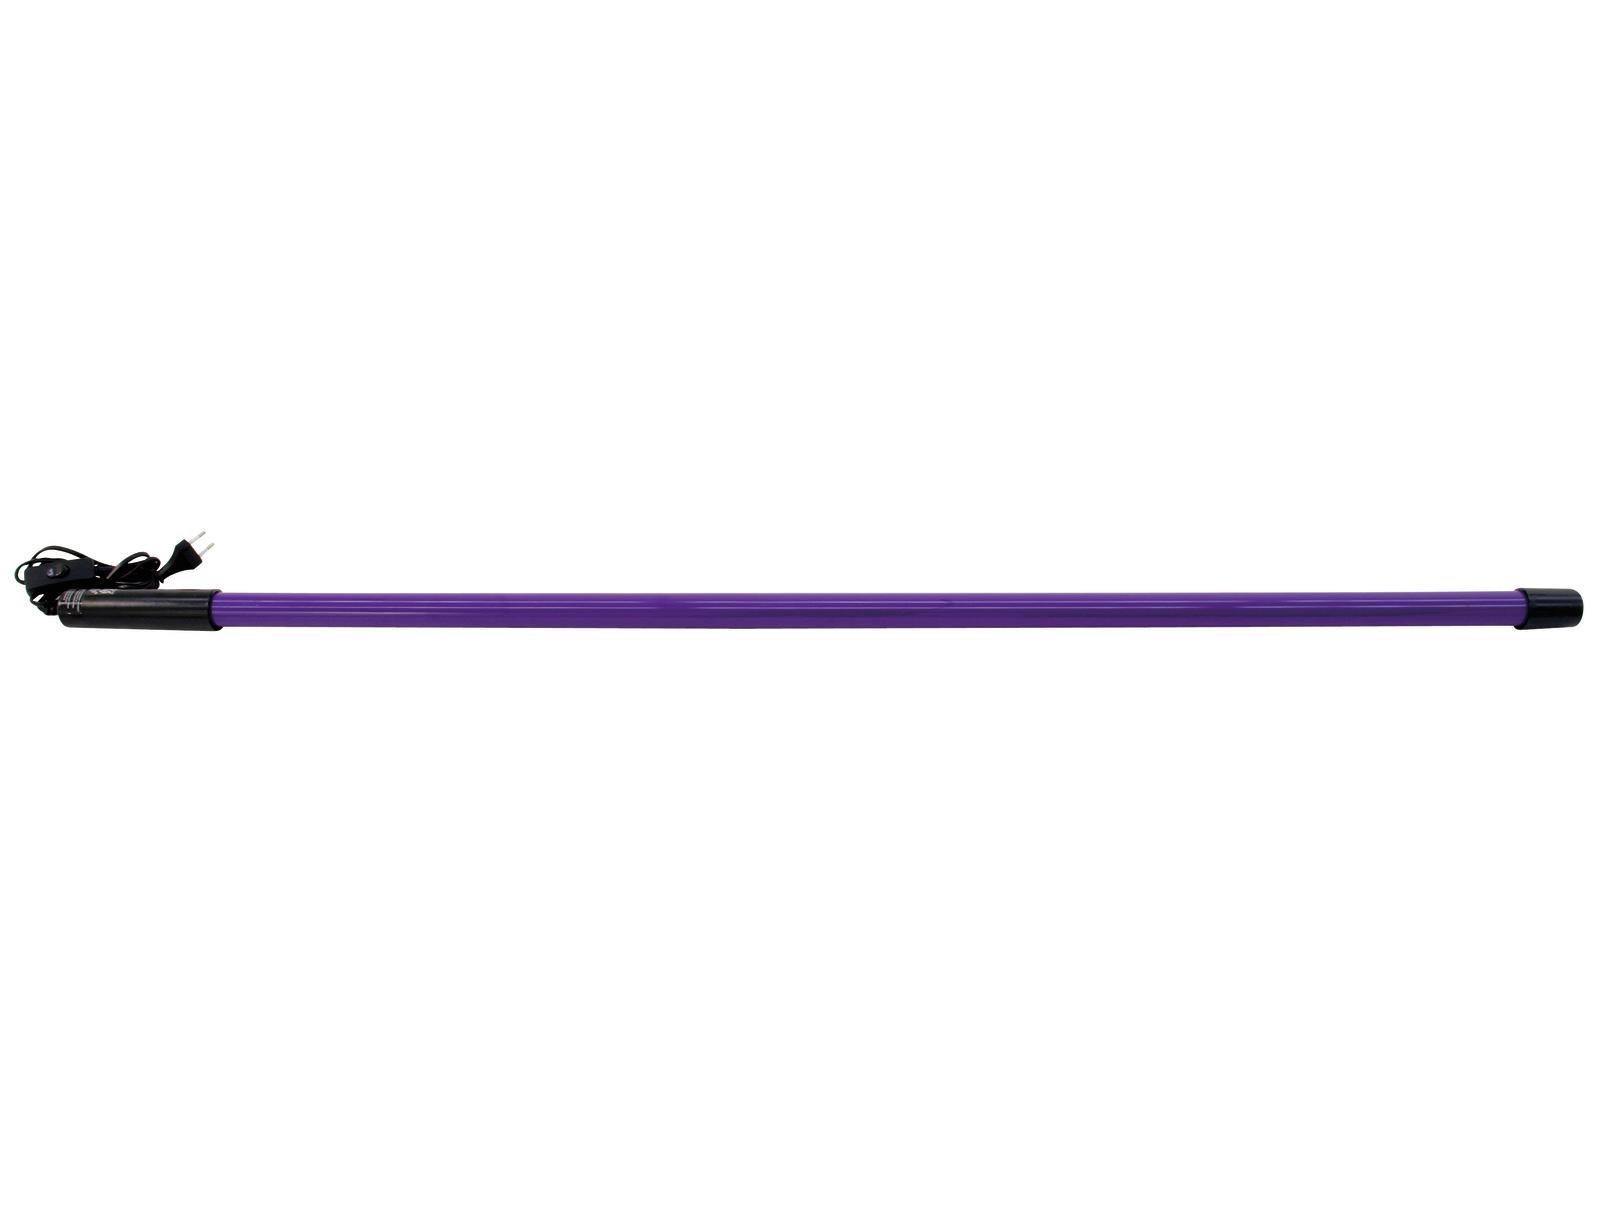 EUROLITE Neon stick Light Tube T8 36W 134cm violet violet L